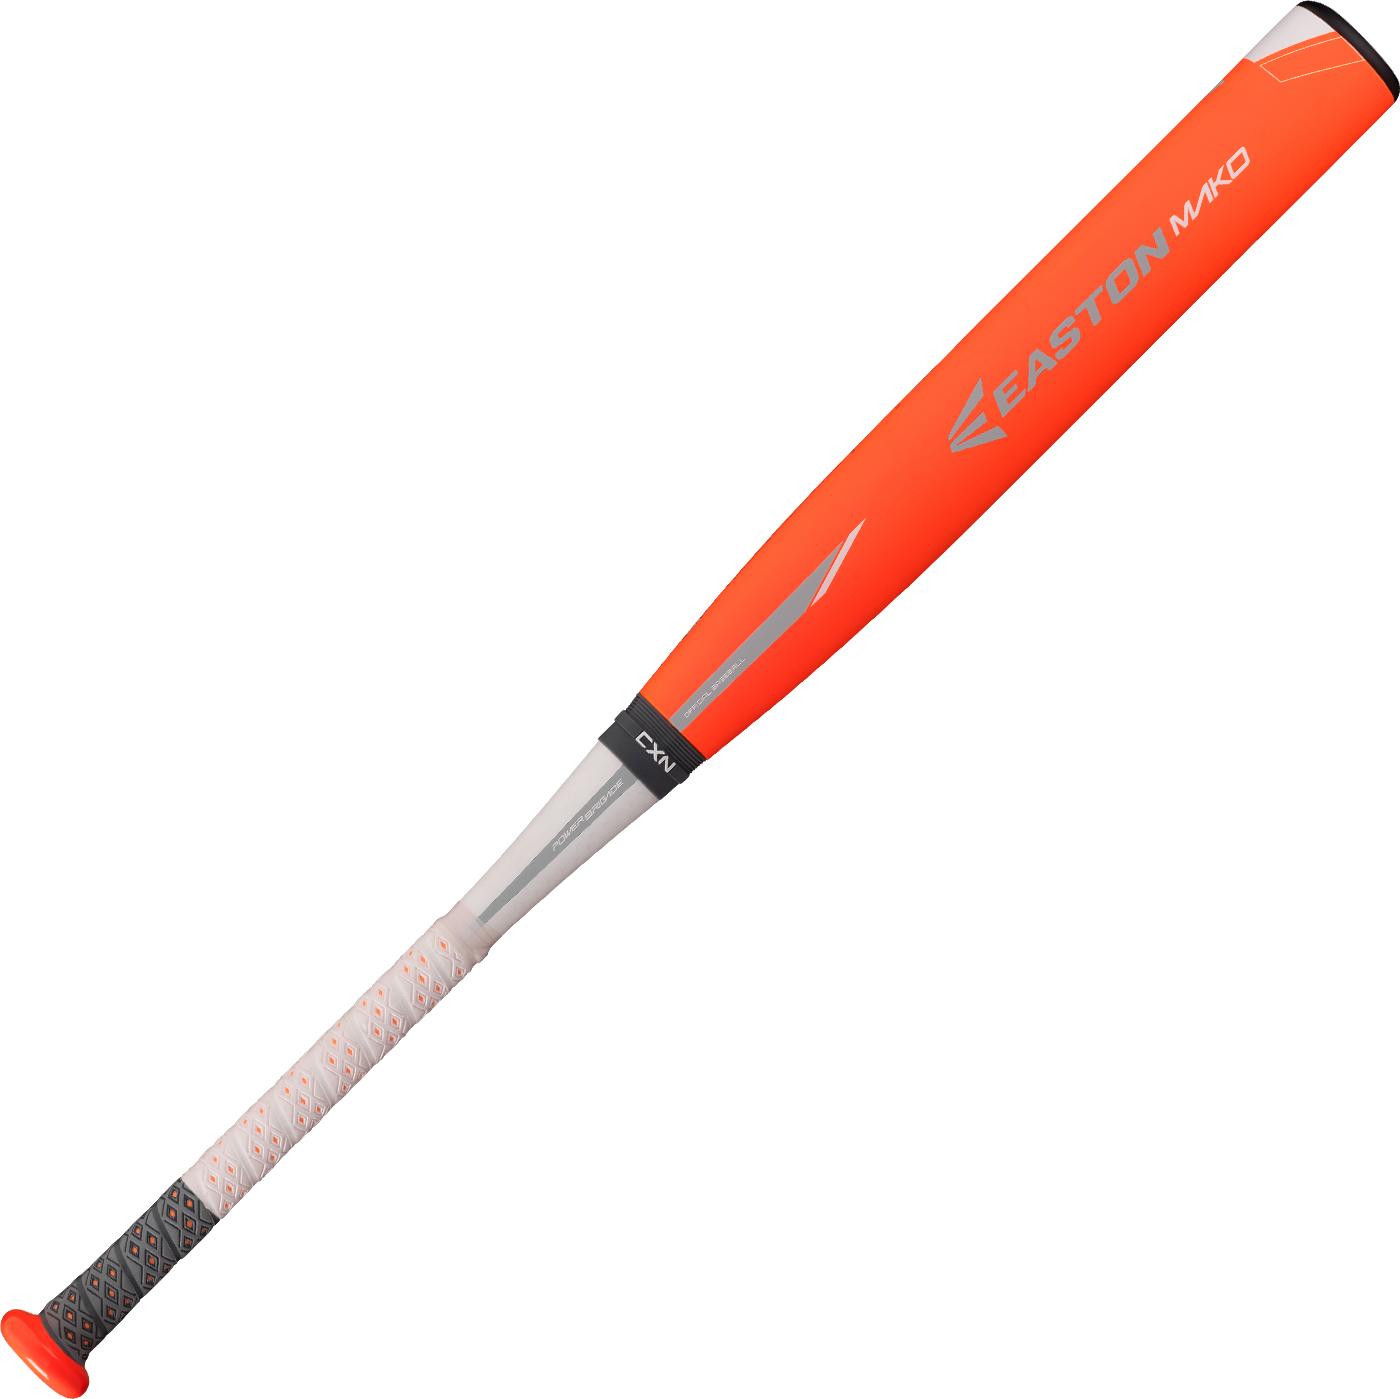 Metal base bat clipart clipart free stock Free Baseball Bat Cliparts, Download Free Clip Art, Free ... clipart free stock